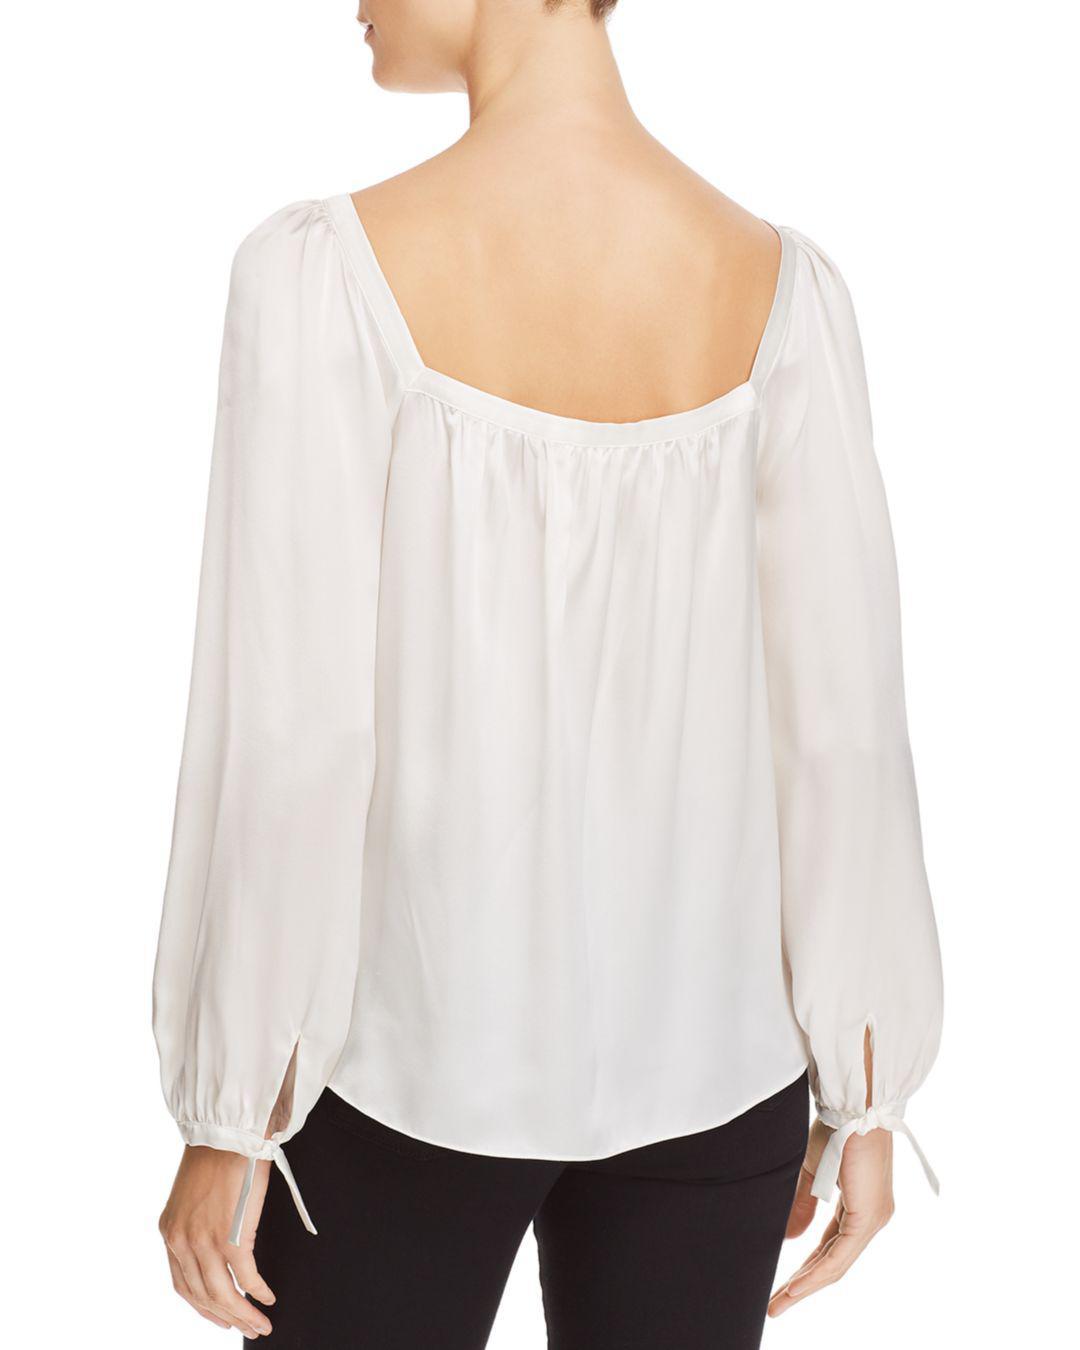 cf6f6708440705 Rebecca Taylor Silk Charmeuse Square-neck Top in White - Lyst